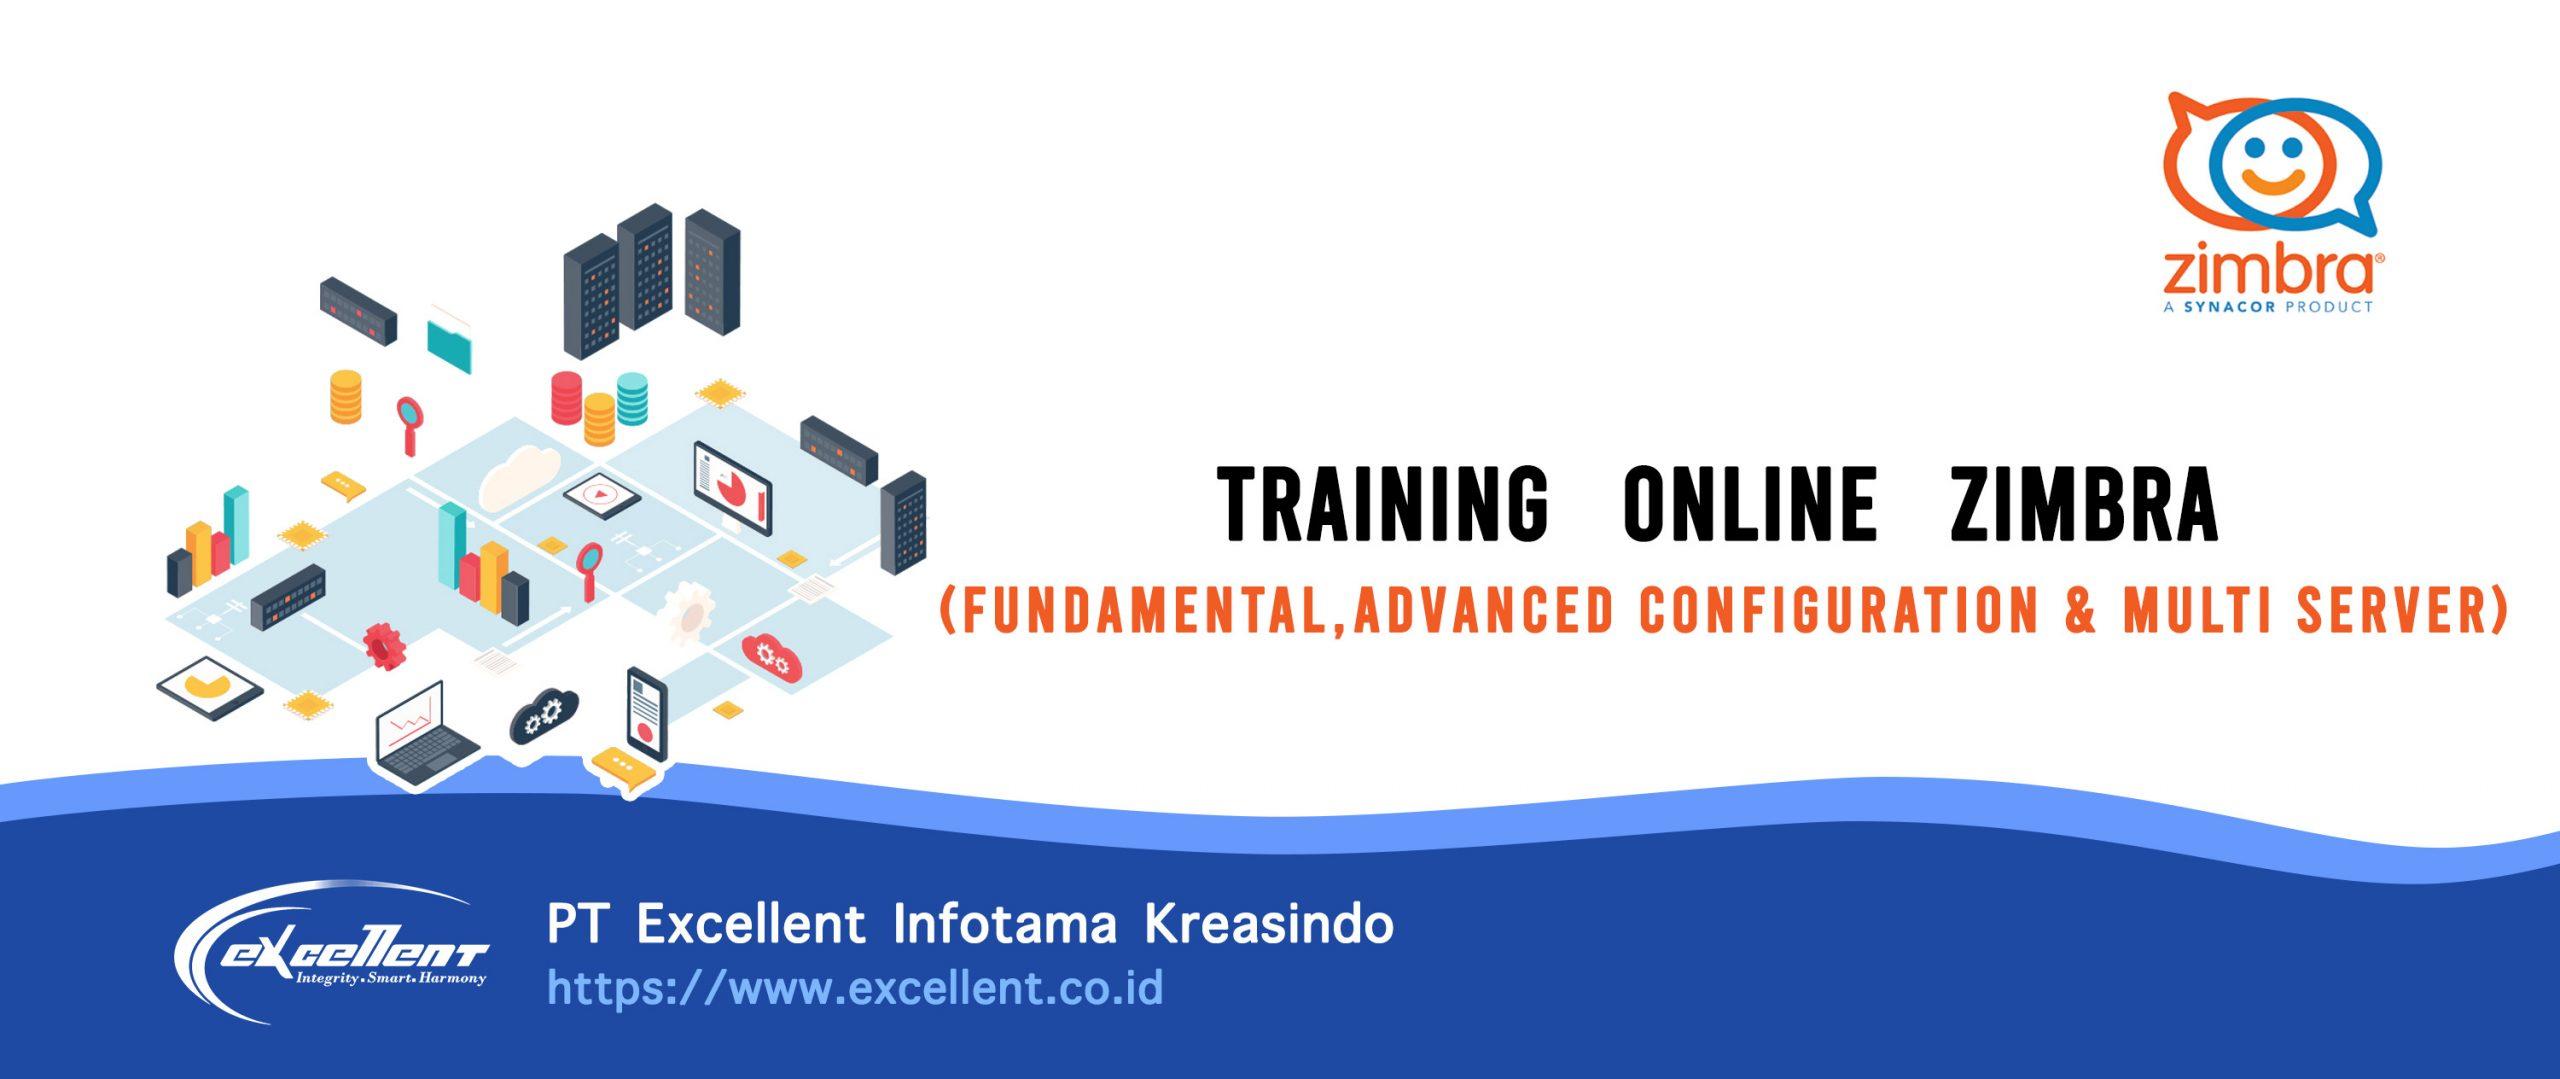 Training Online Zimbra Mail Server